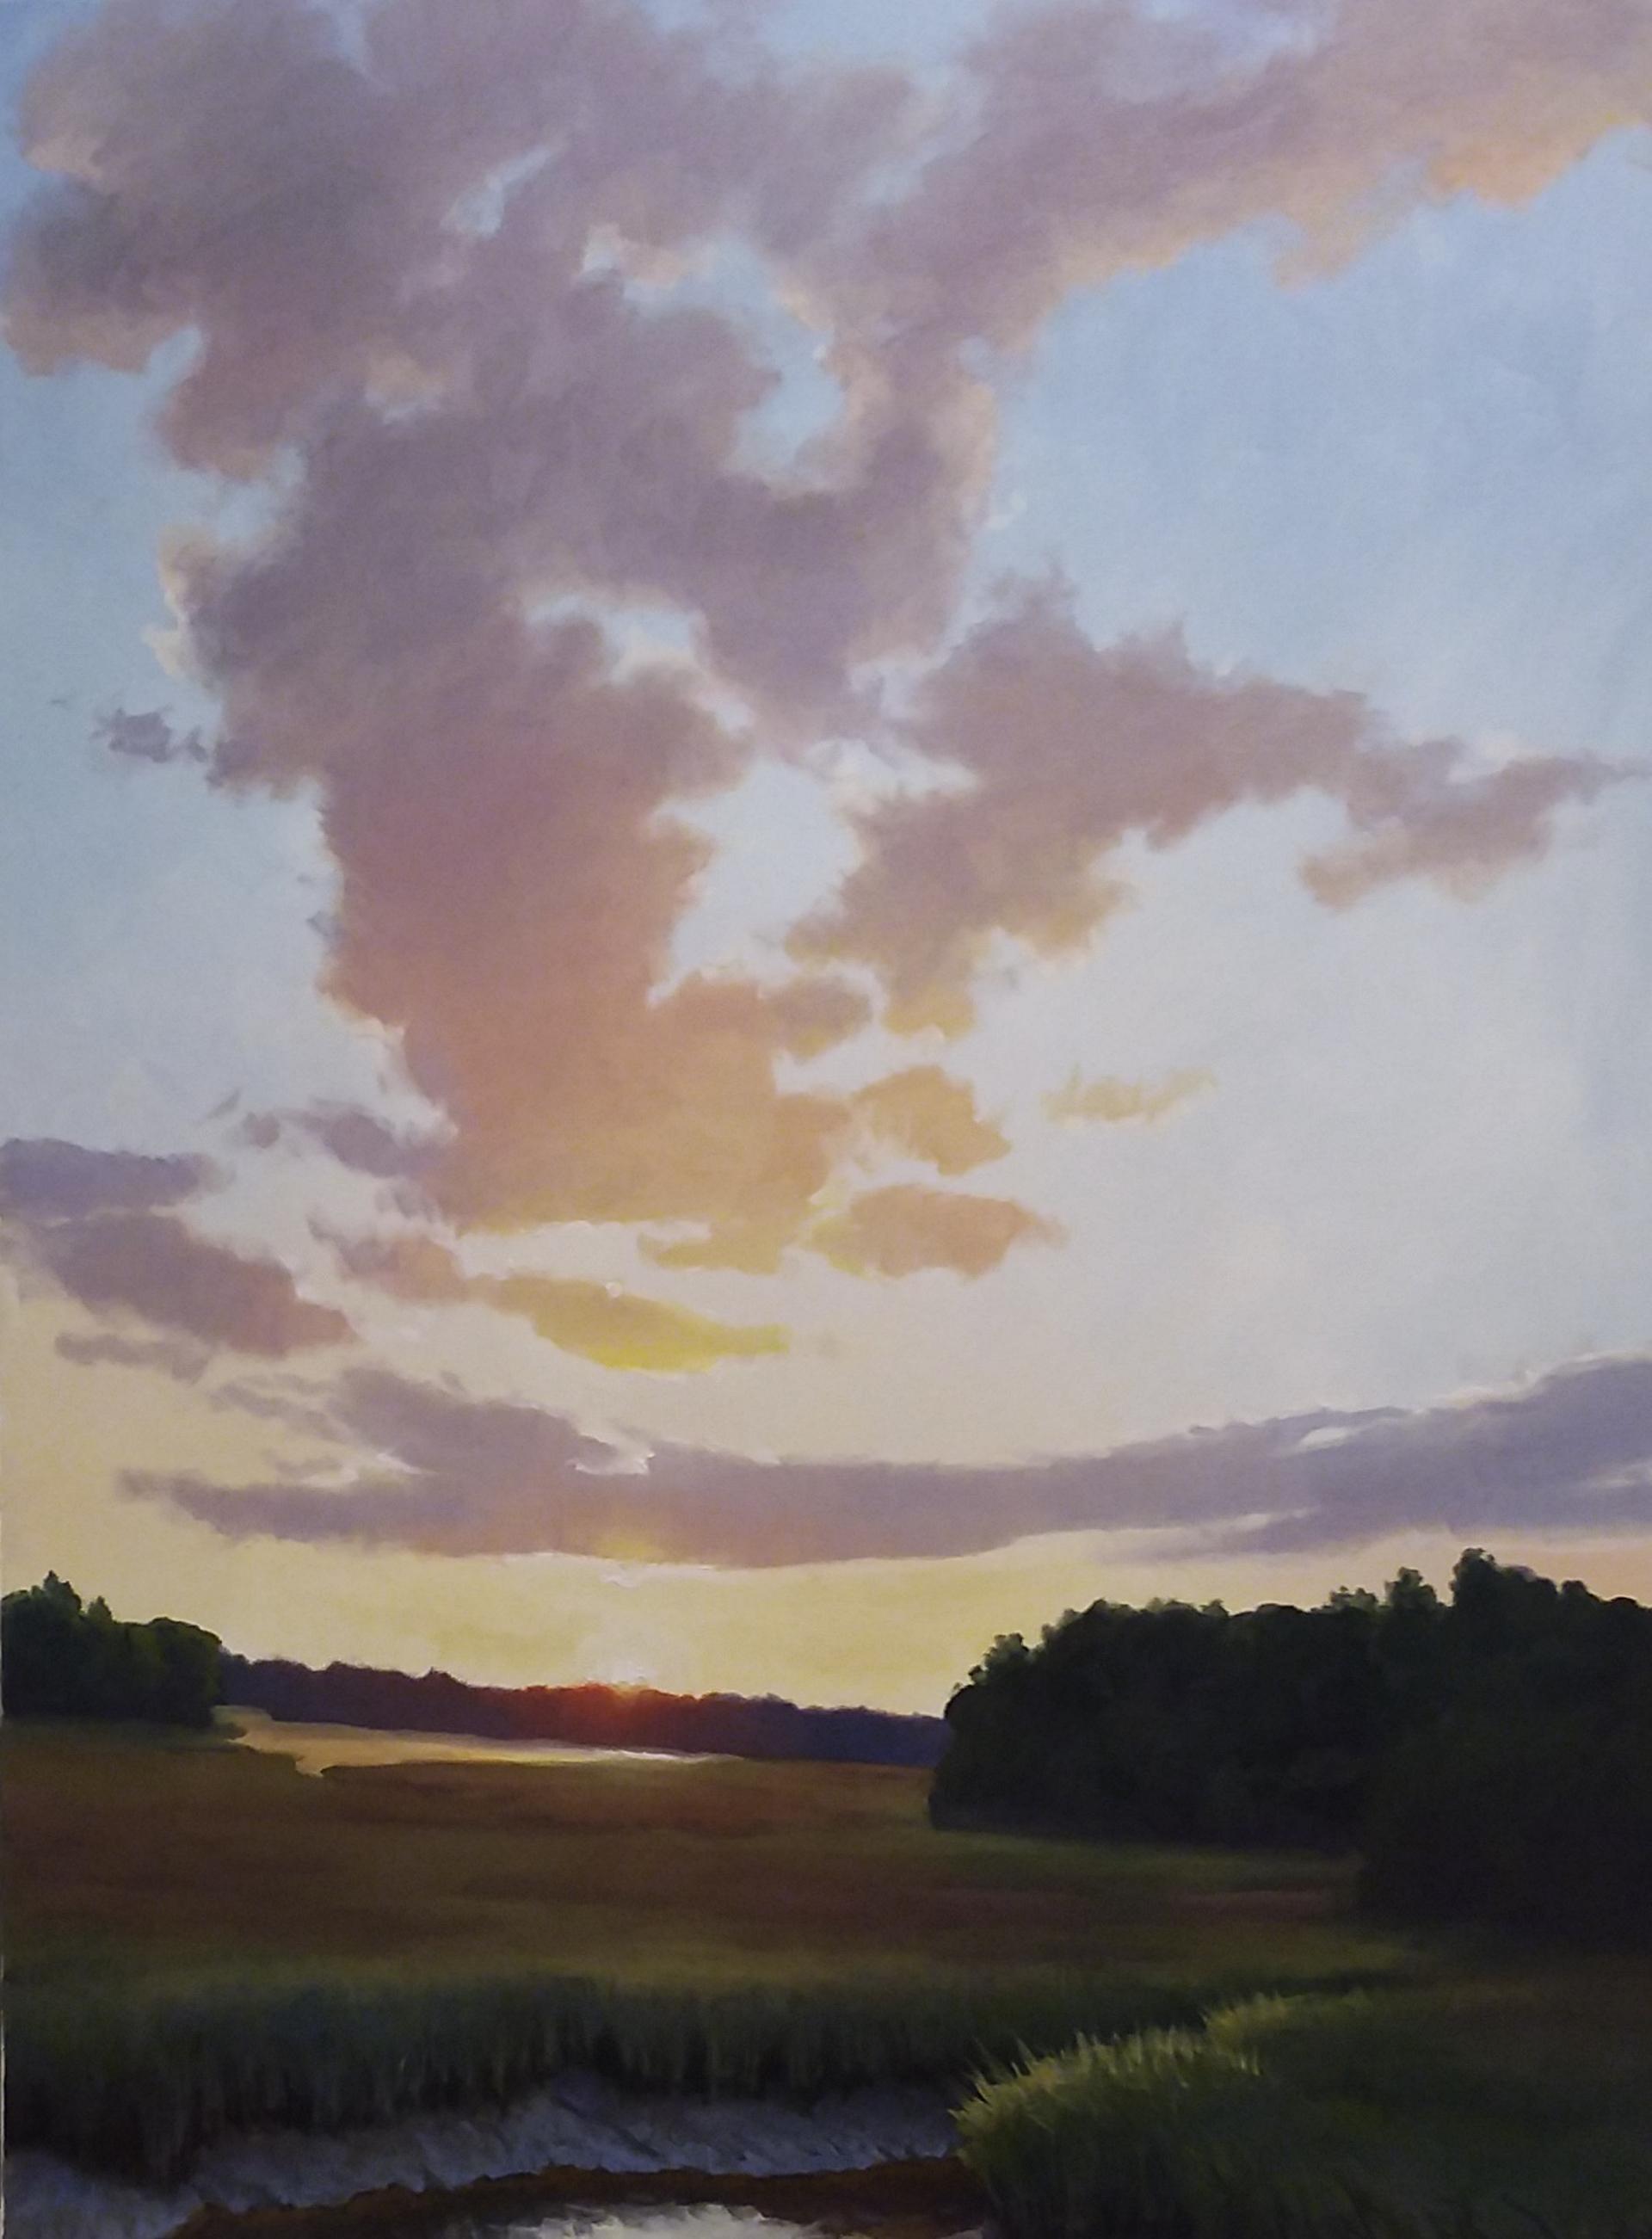 Marsh at Sunset by ARMAND CABRERA